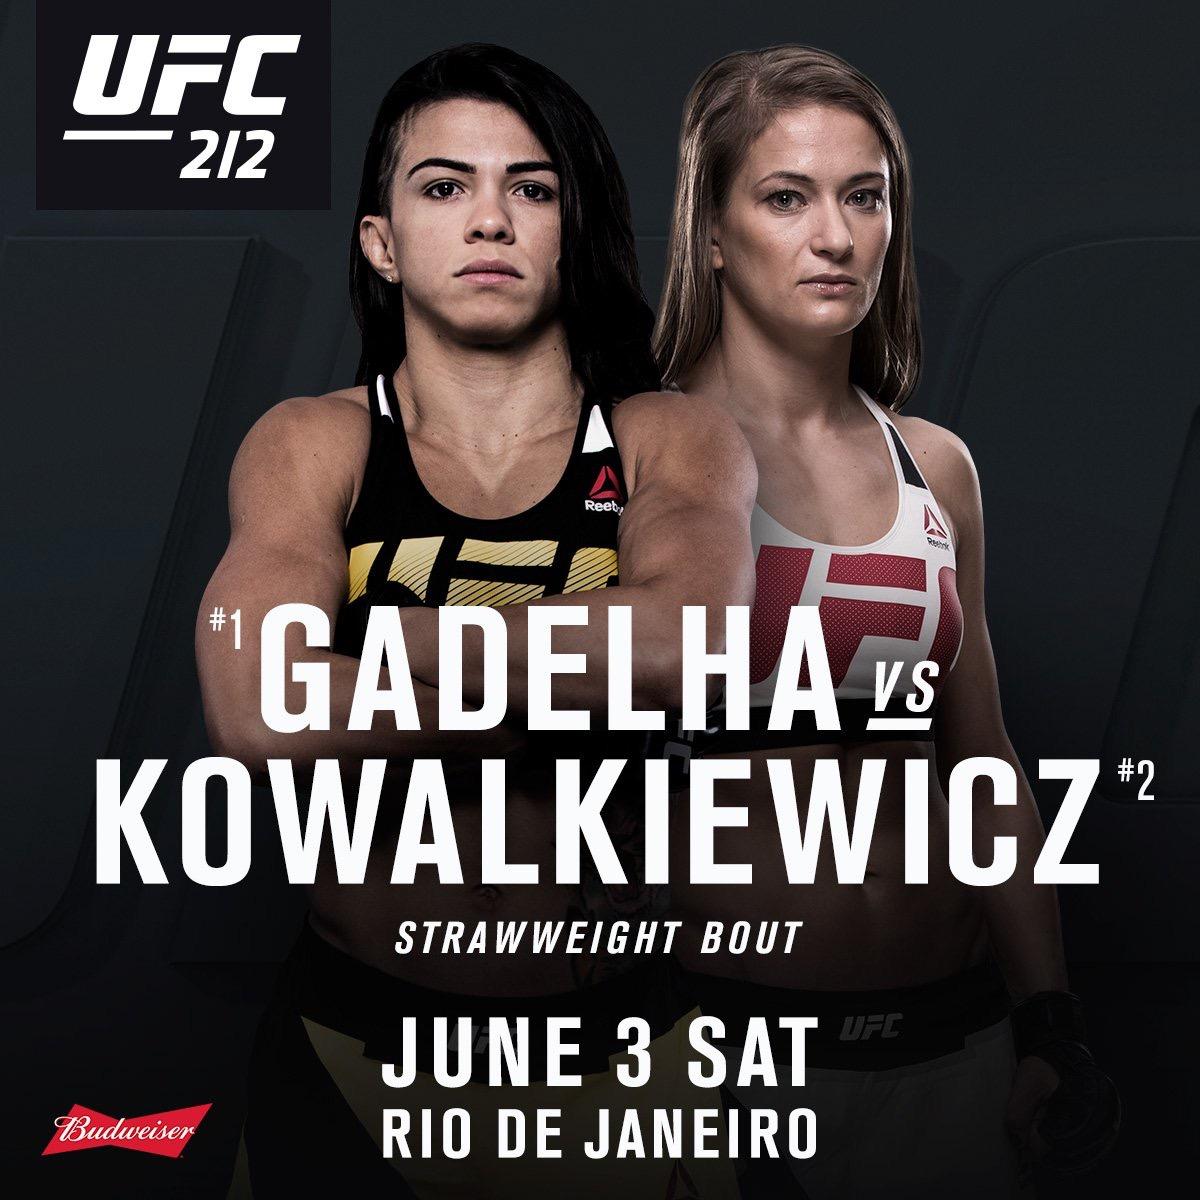 Claudia vs Karolina confirmed. -